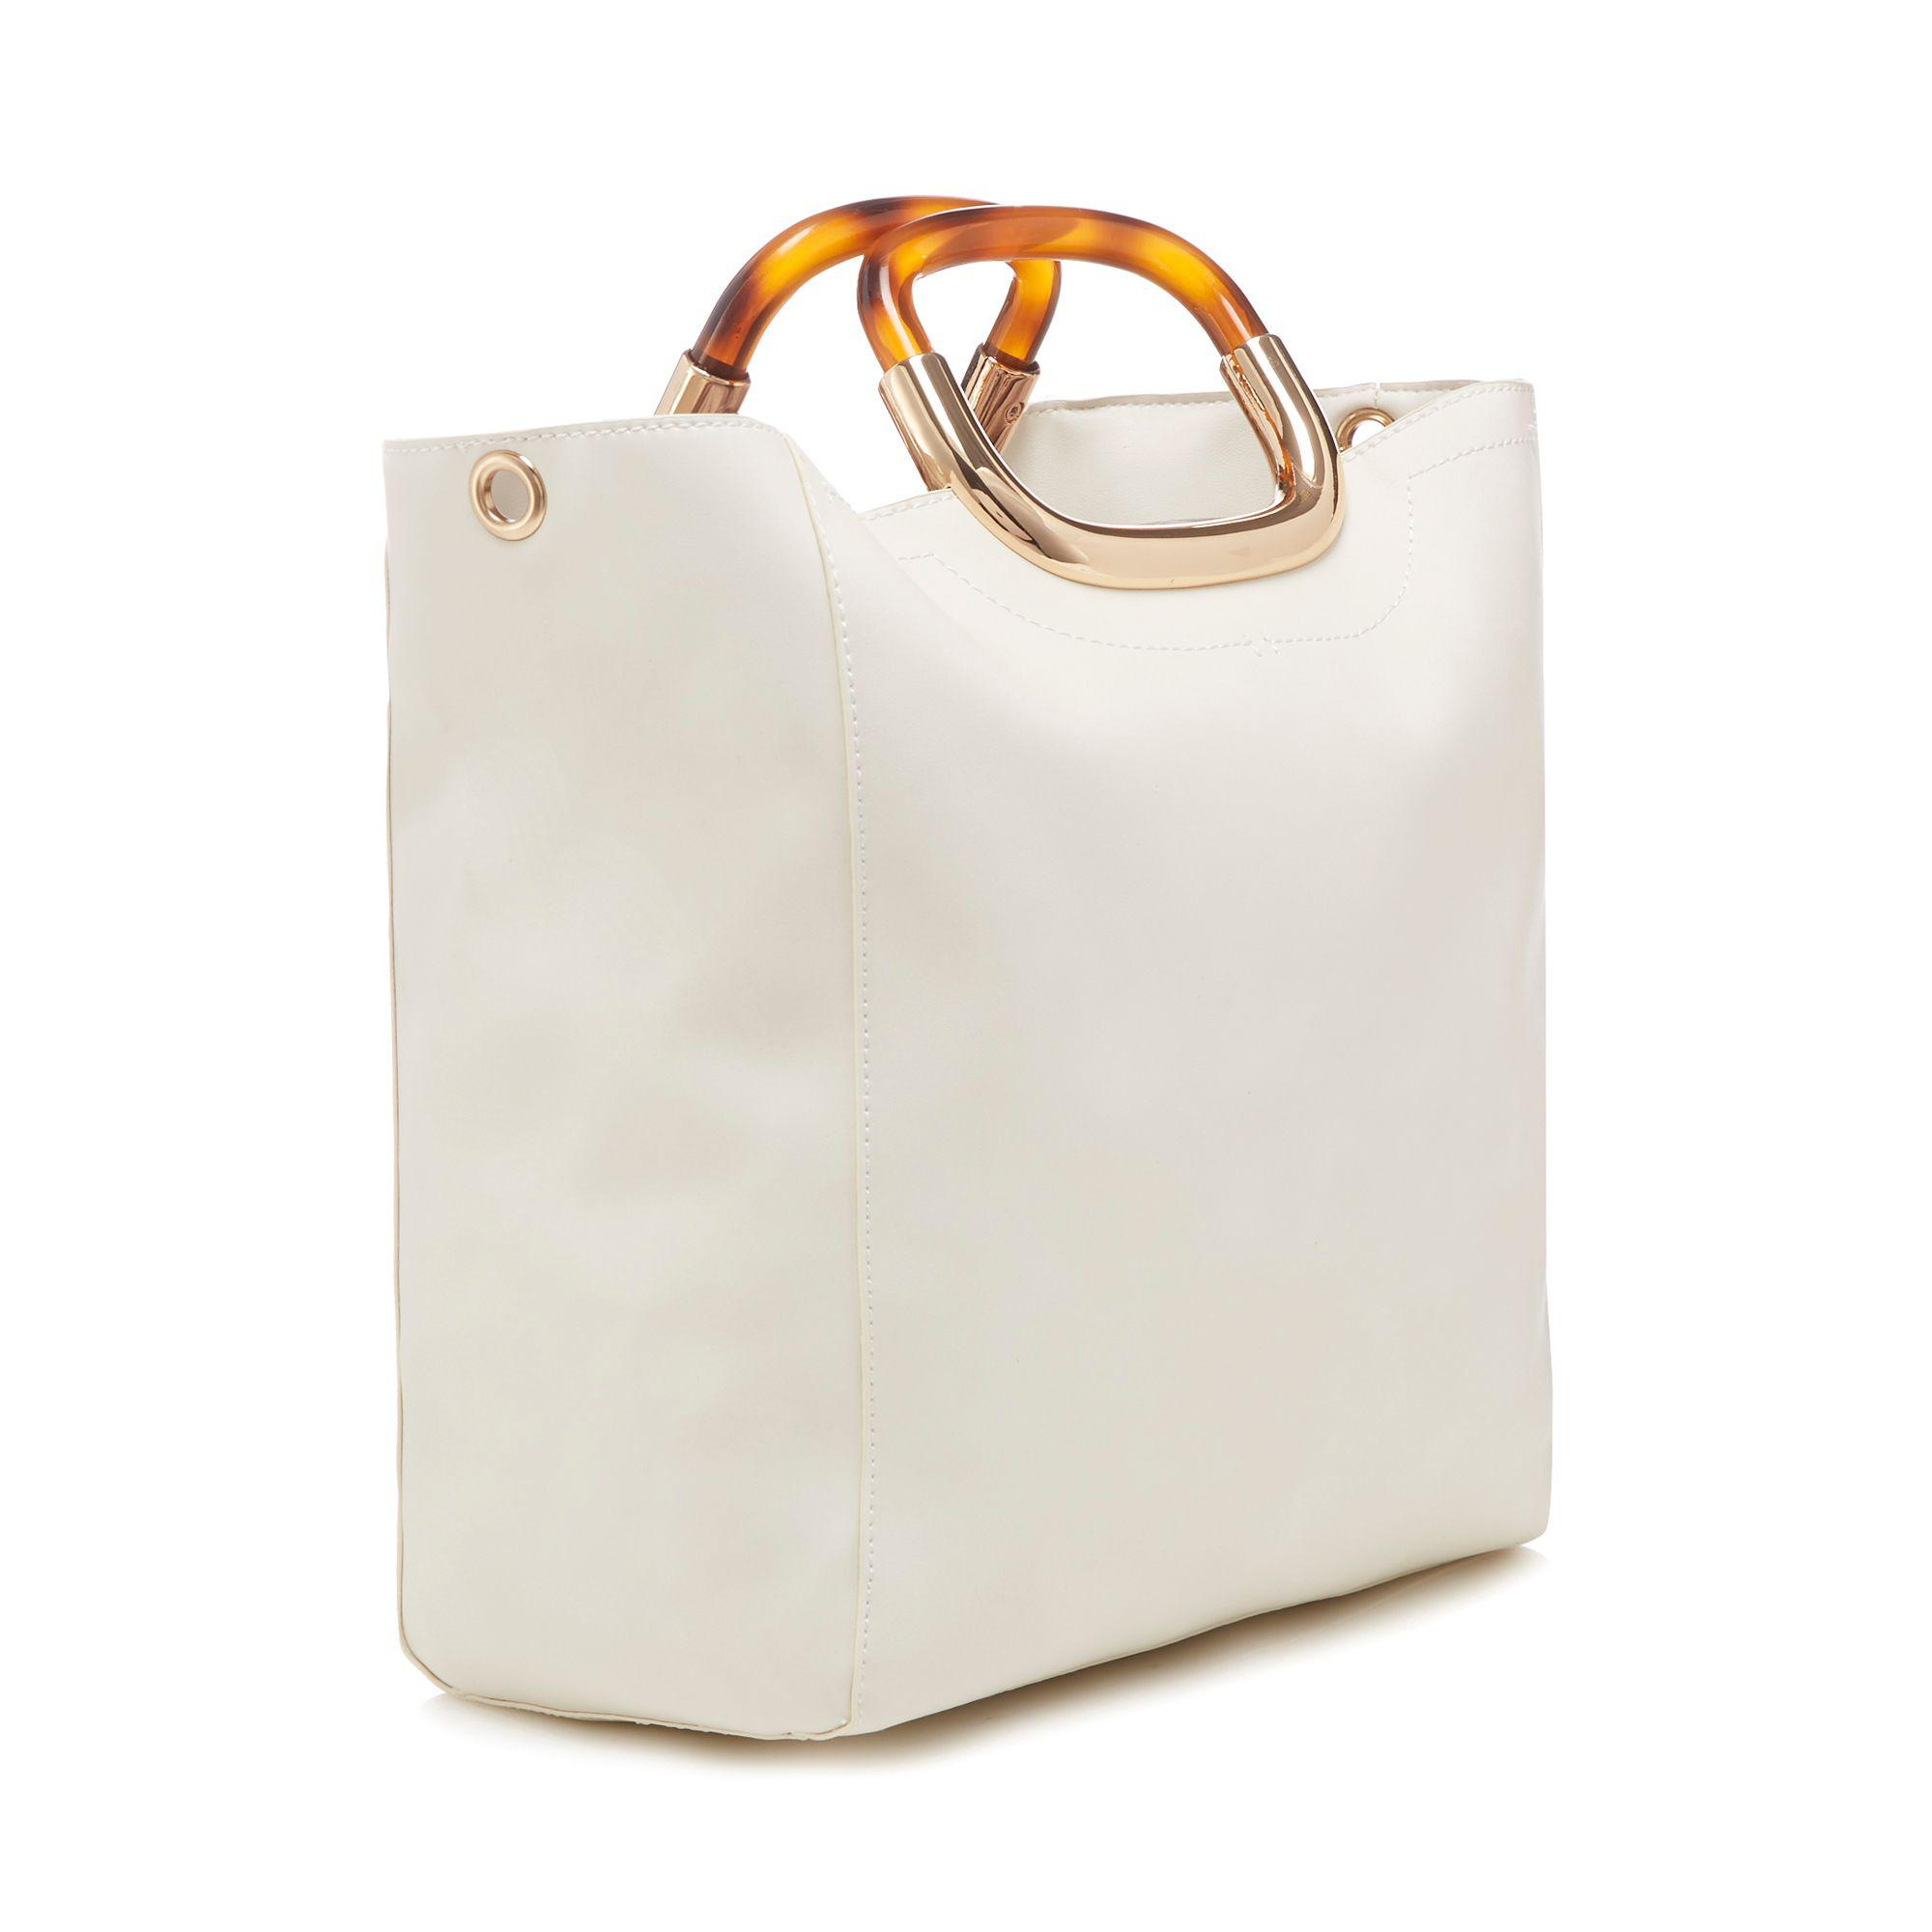 4c69985f76 Faith White Tortoiseshell Handle Grab Bag in White - Lyst